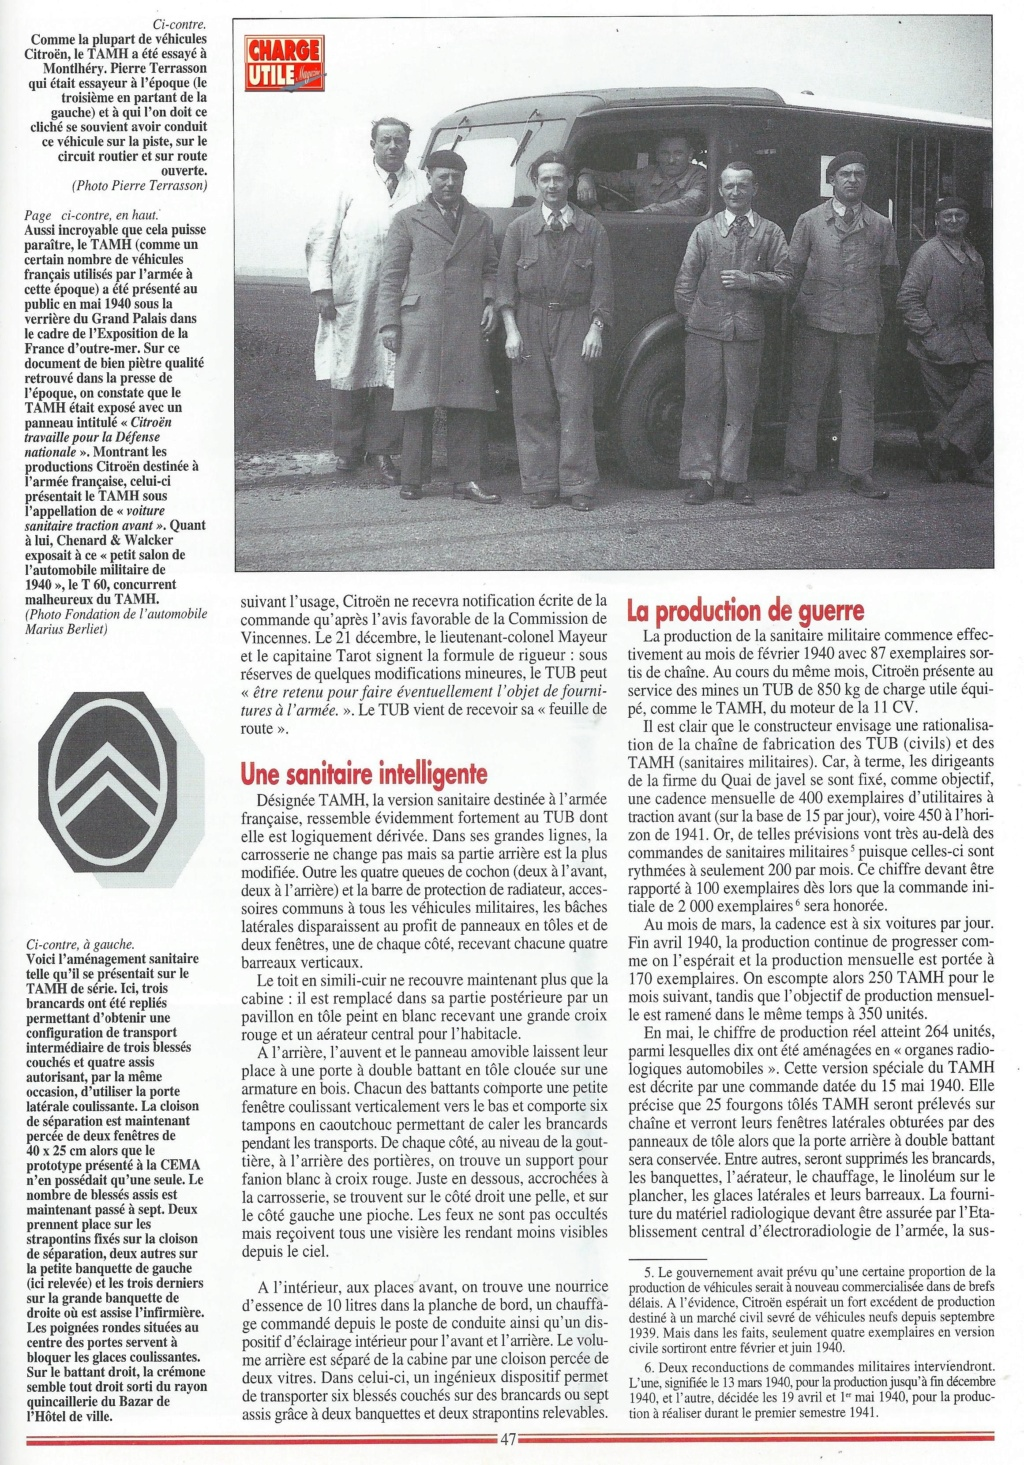 le TUB,TUC et TAMH - Page 3 Mab_0115